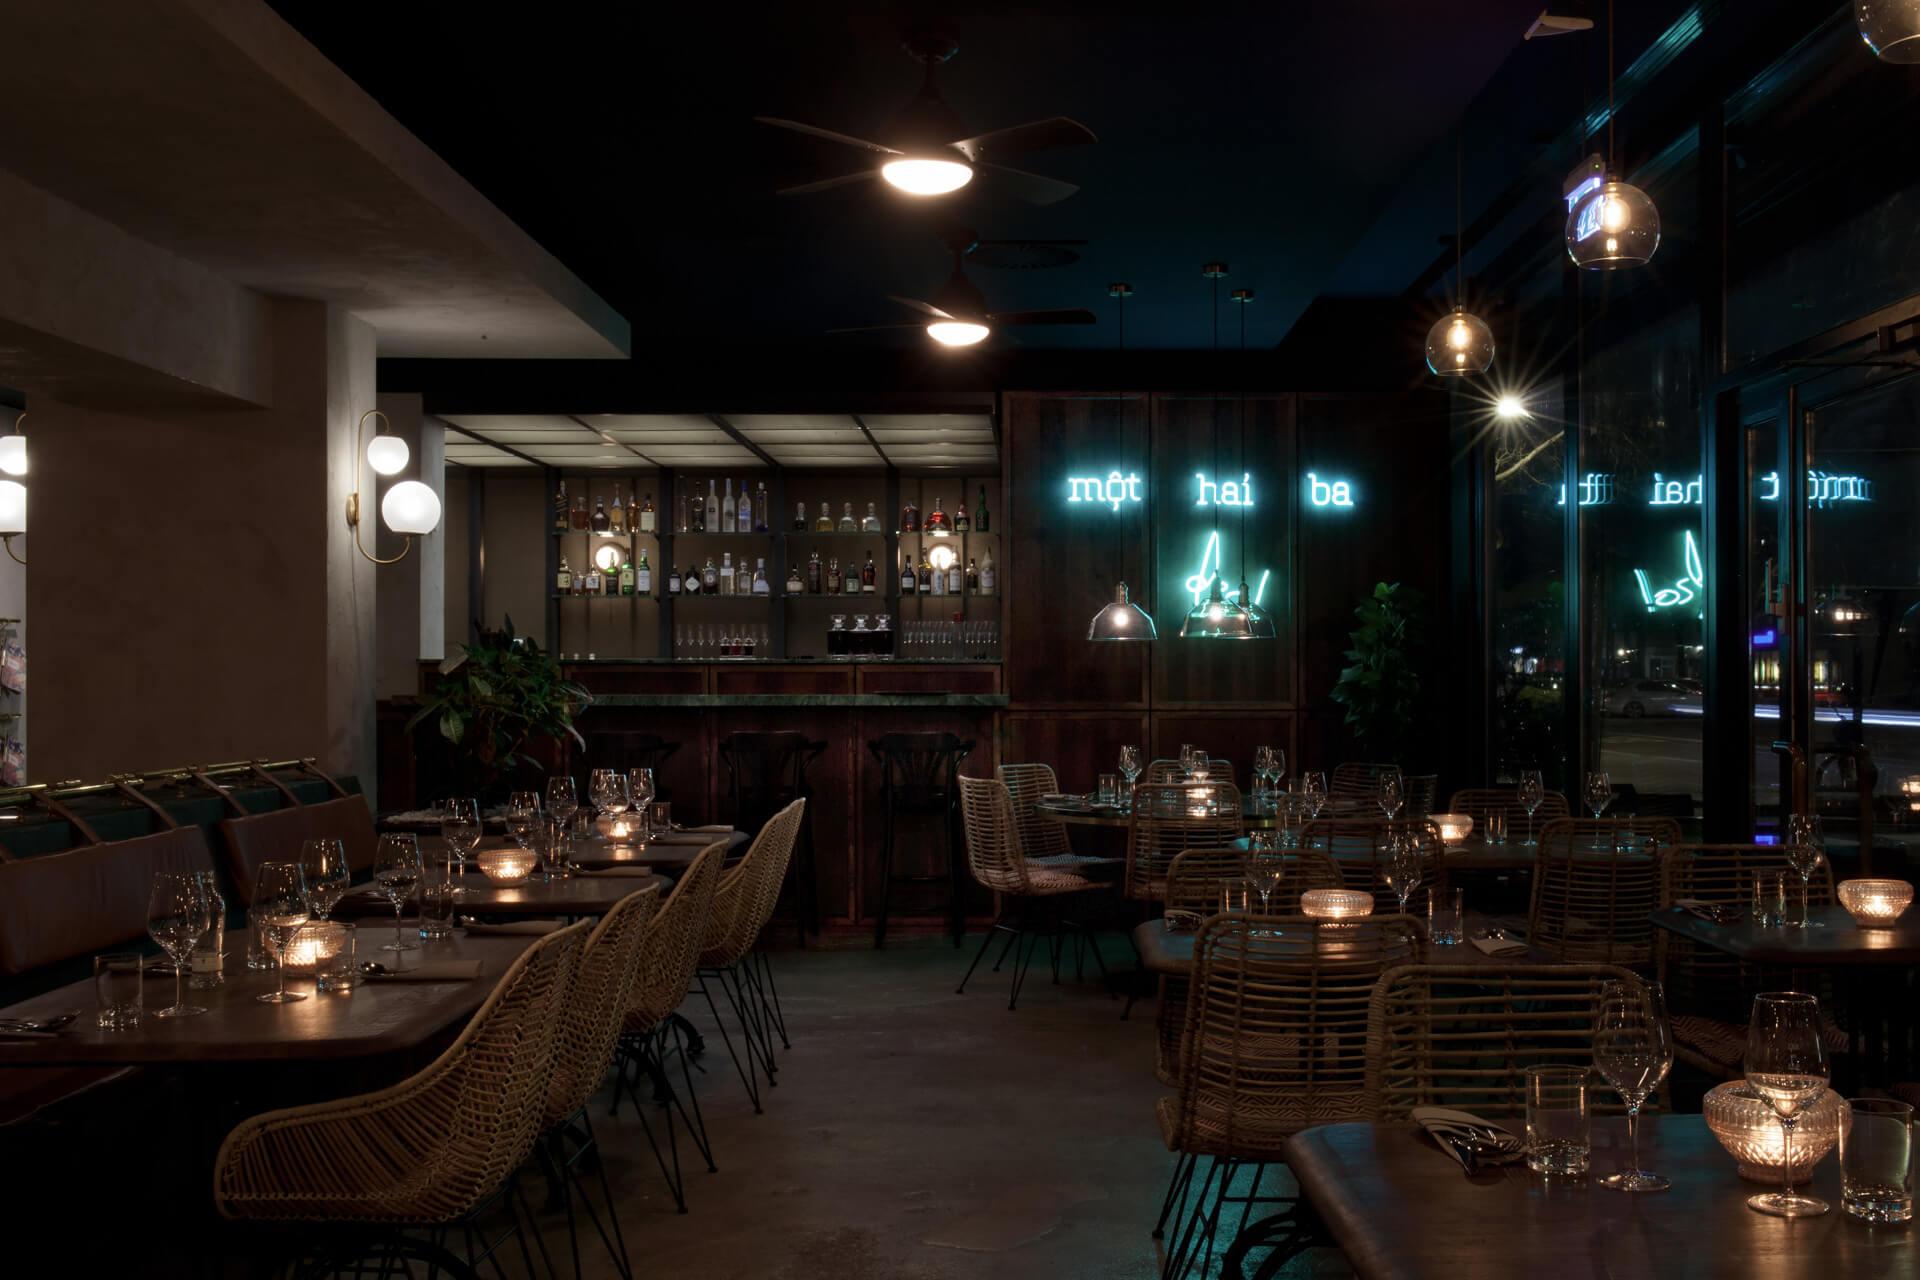 29_LIUC_TinnappelMetz_Restaurant_166_pt 1